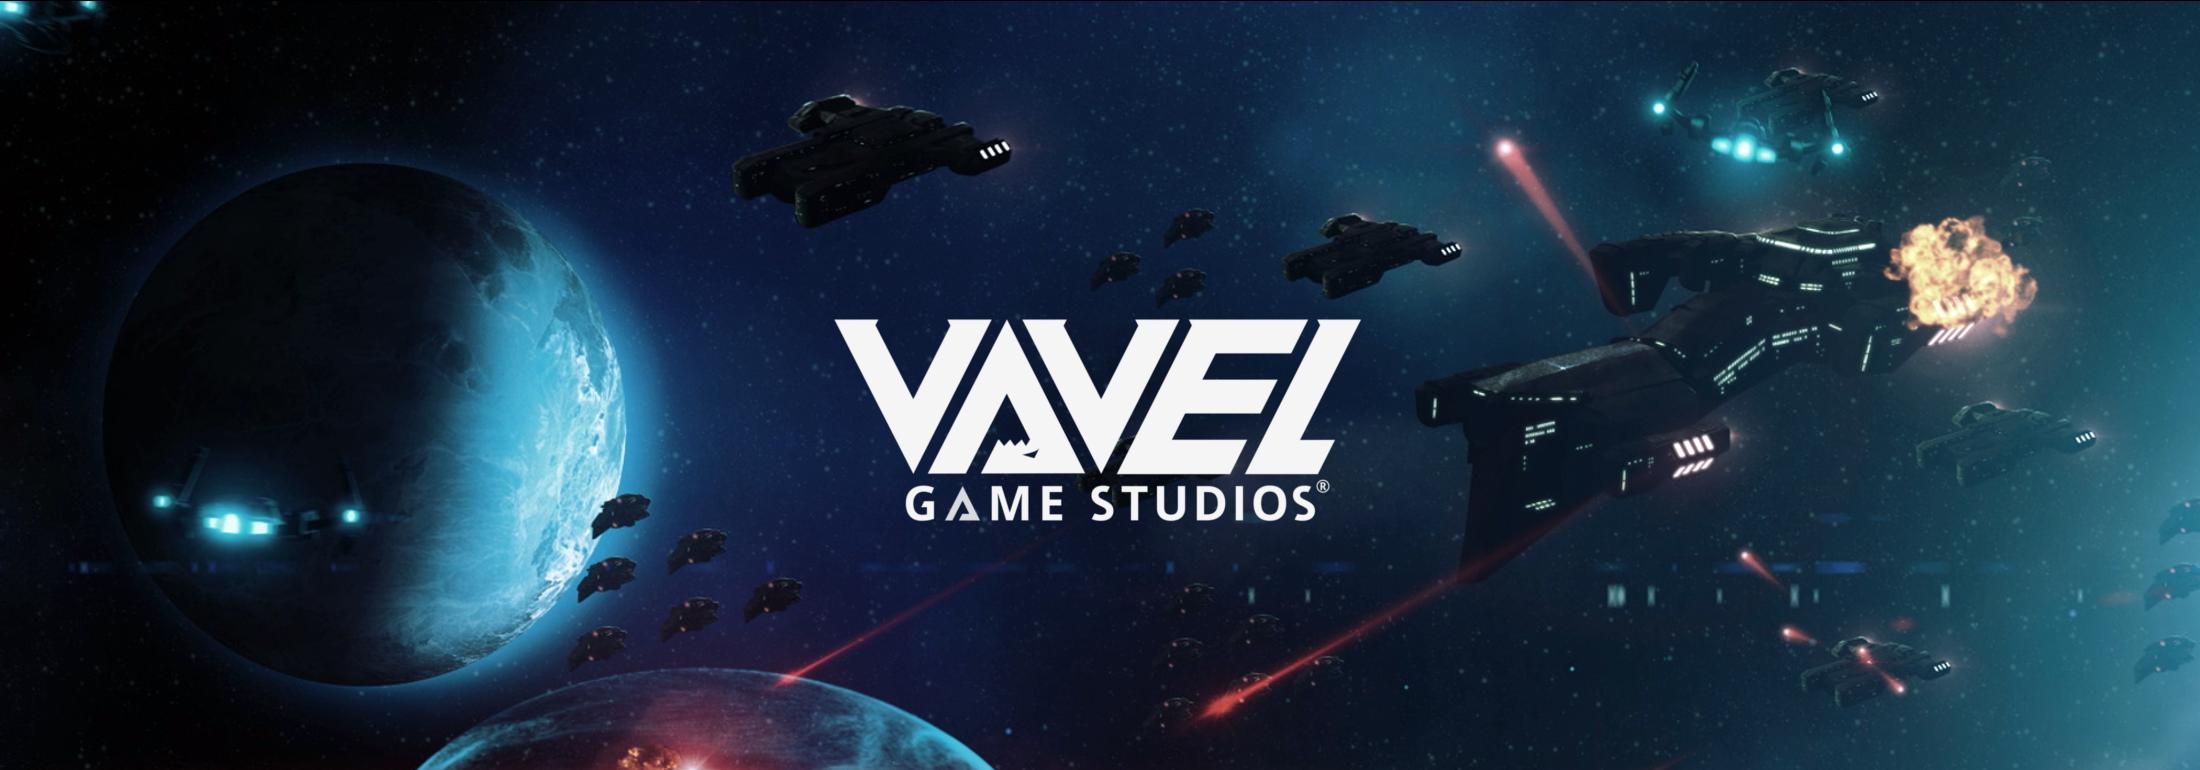 Team – Vavel Game Studios